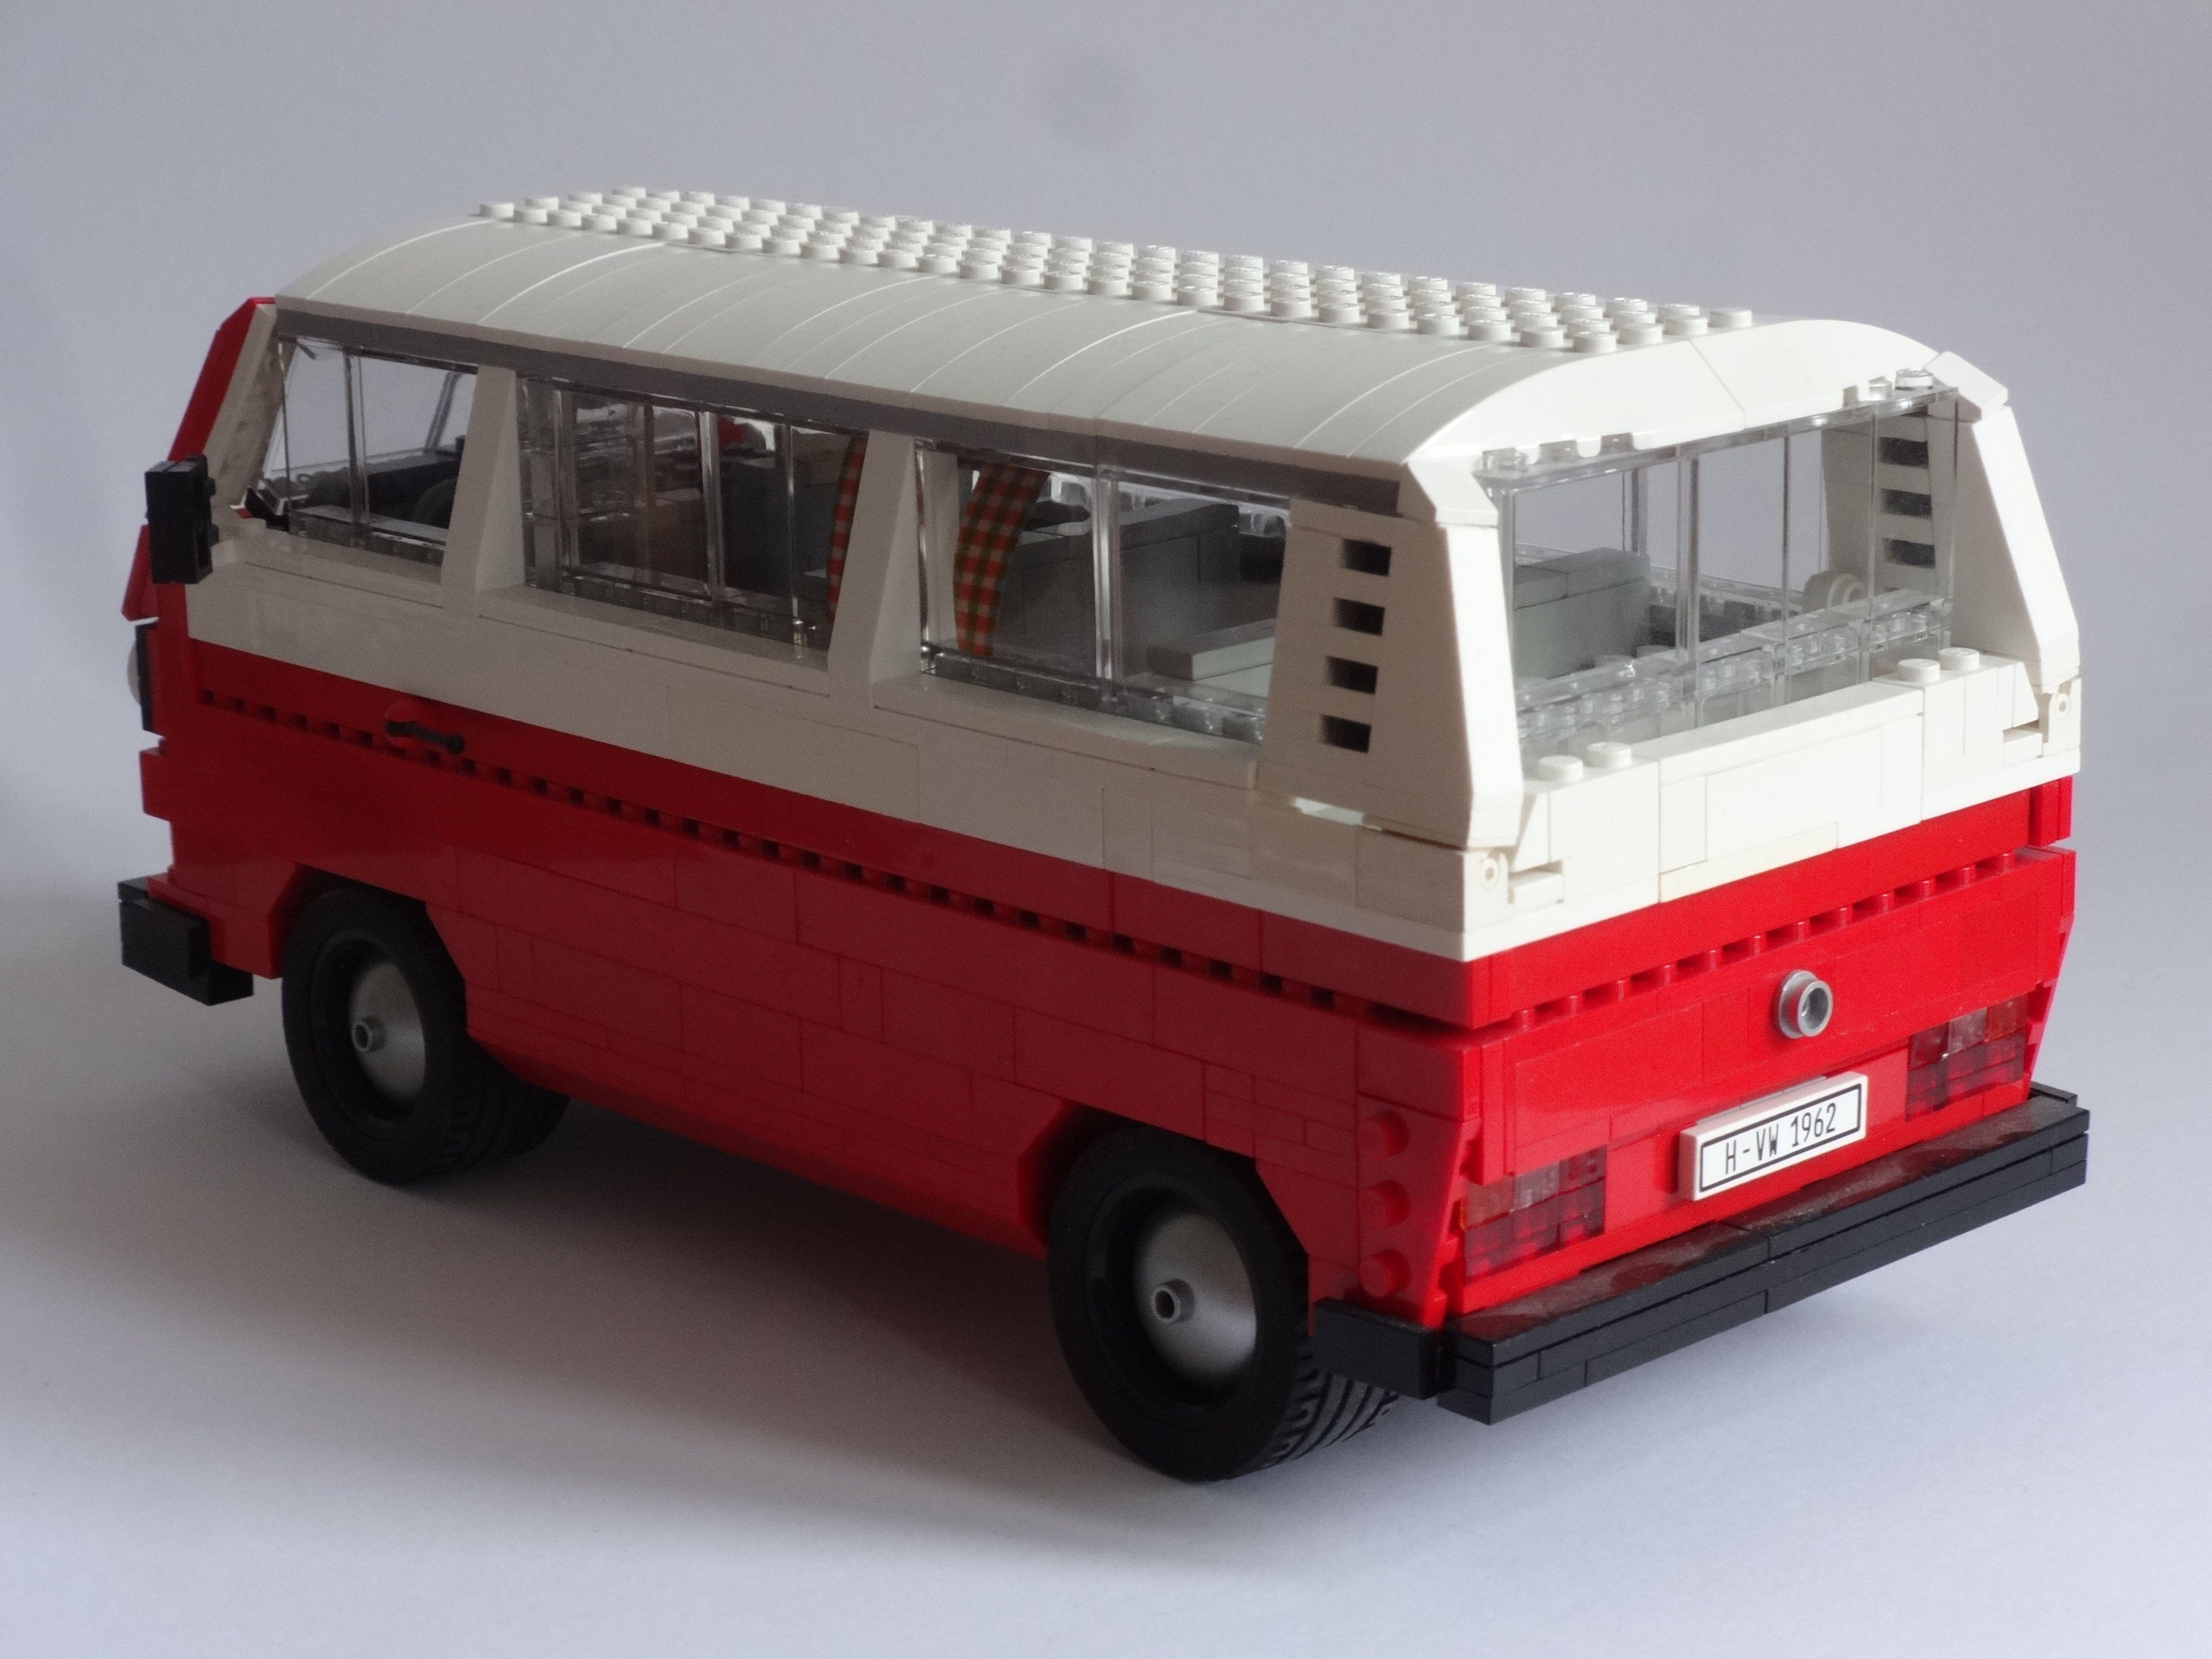 lego vw t3 pinterest lego lego technic and. Black Bedroom Furniture Sets. Home Design Ideas